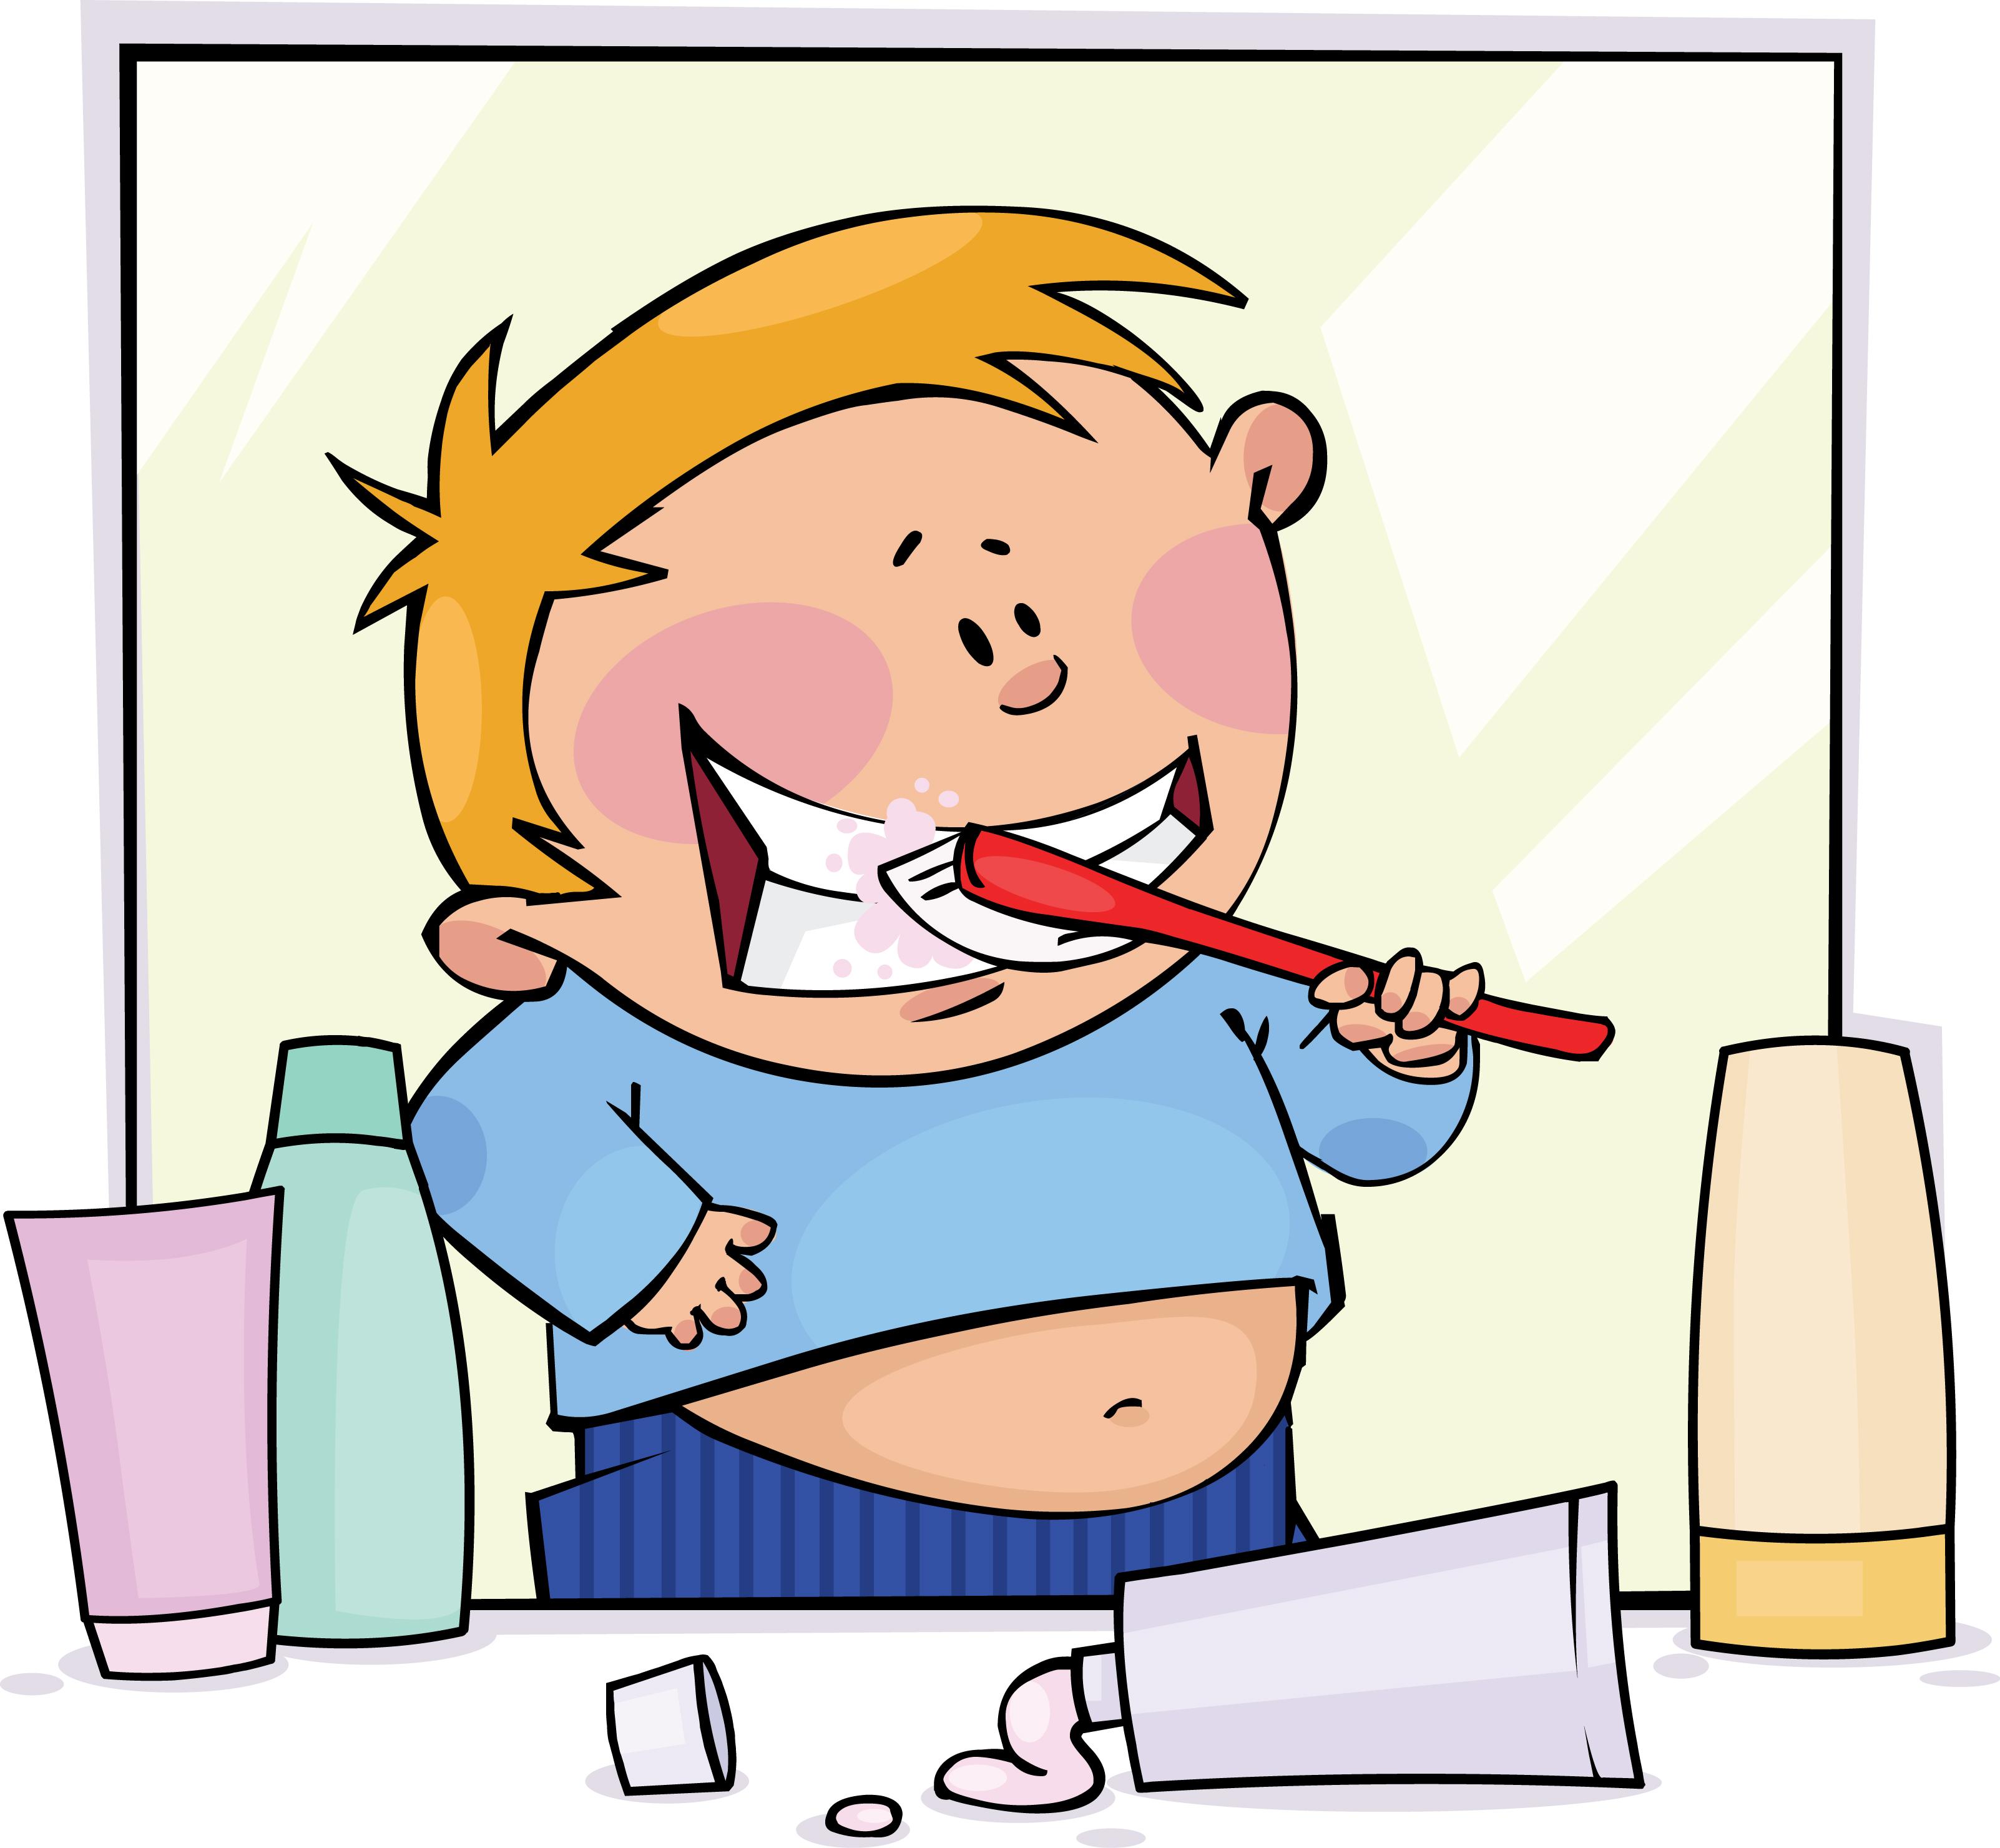 Cartoon of child brushing their teeth